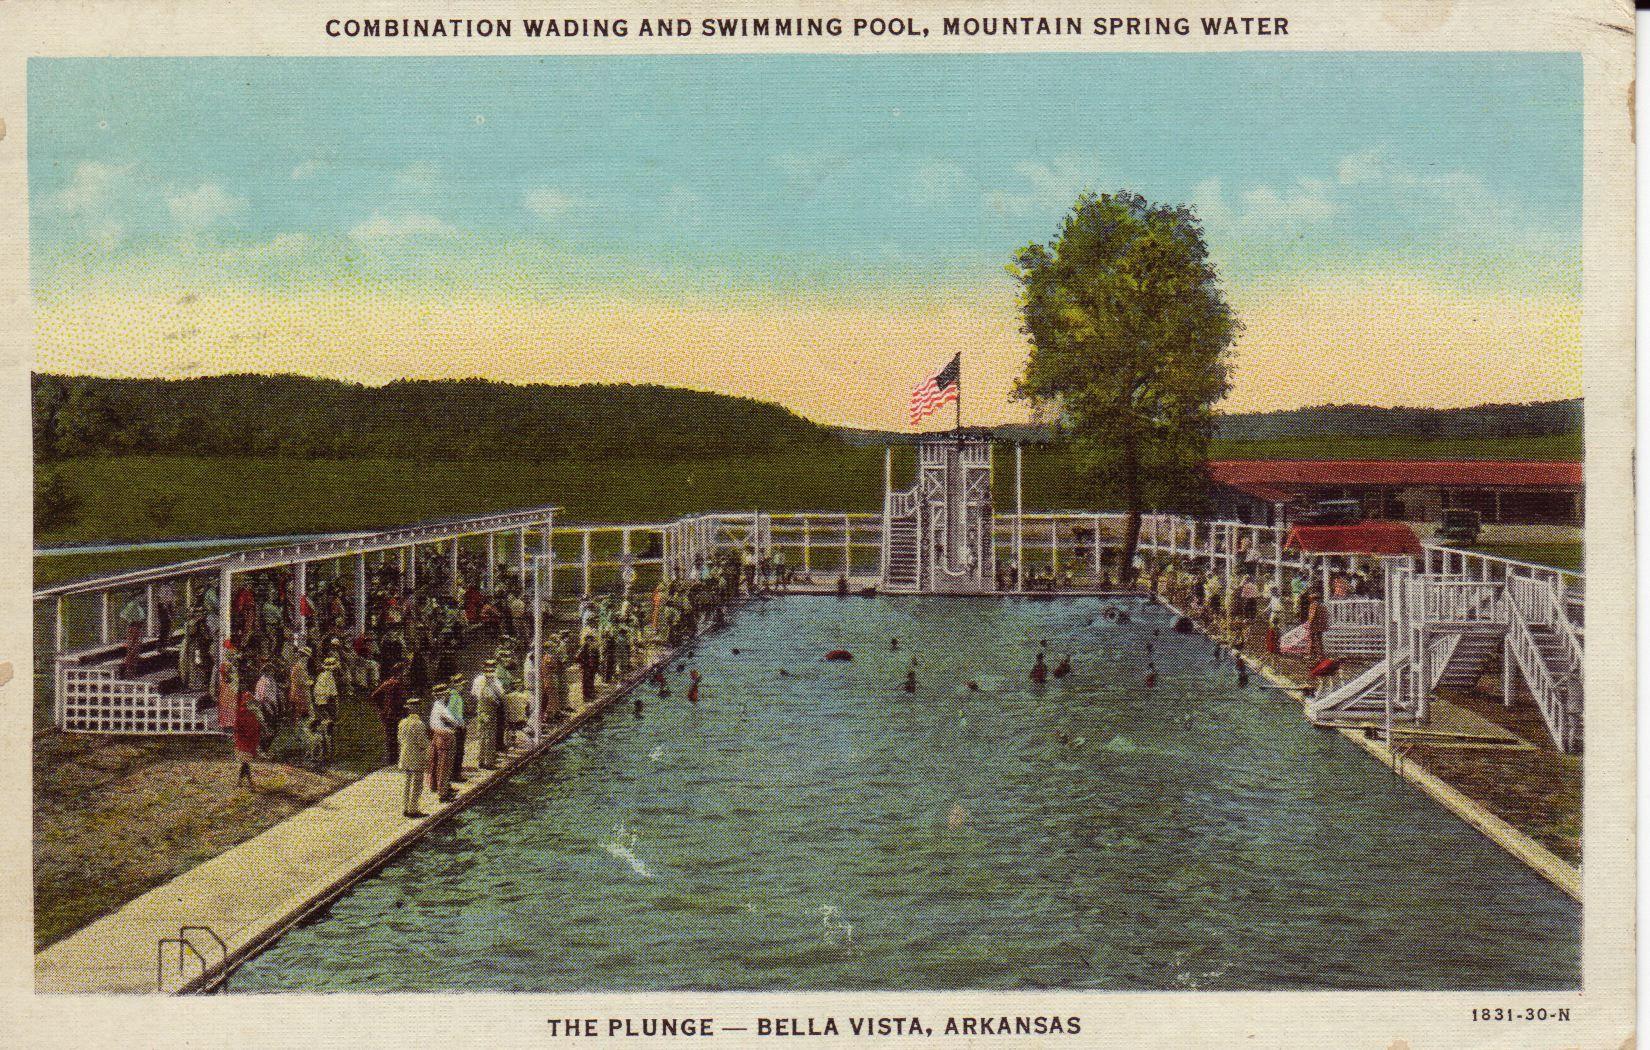 Arkansas bella vista the plunge 1 historic swimming for Bentonville pool